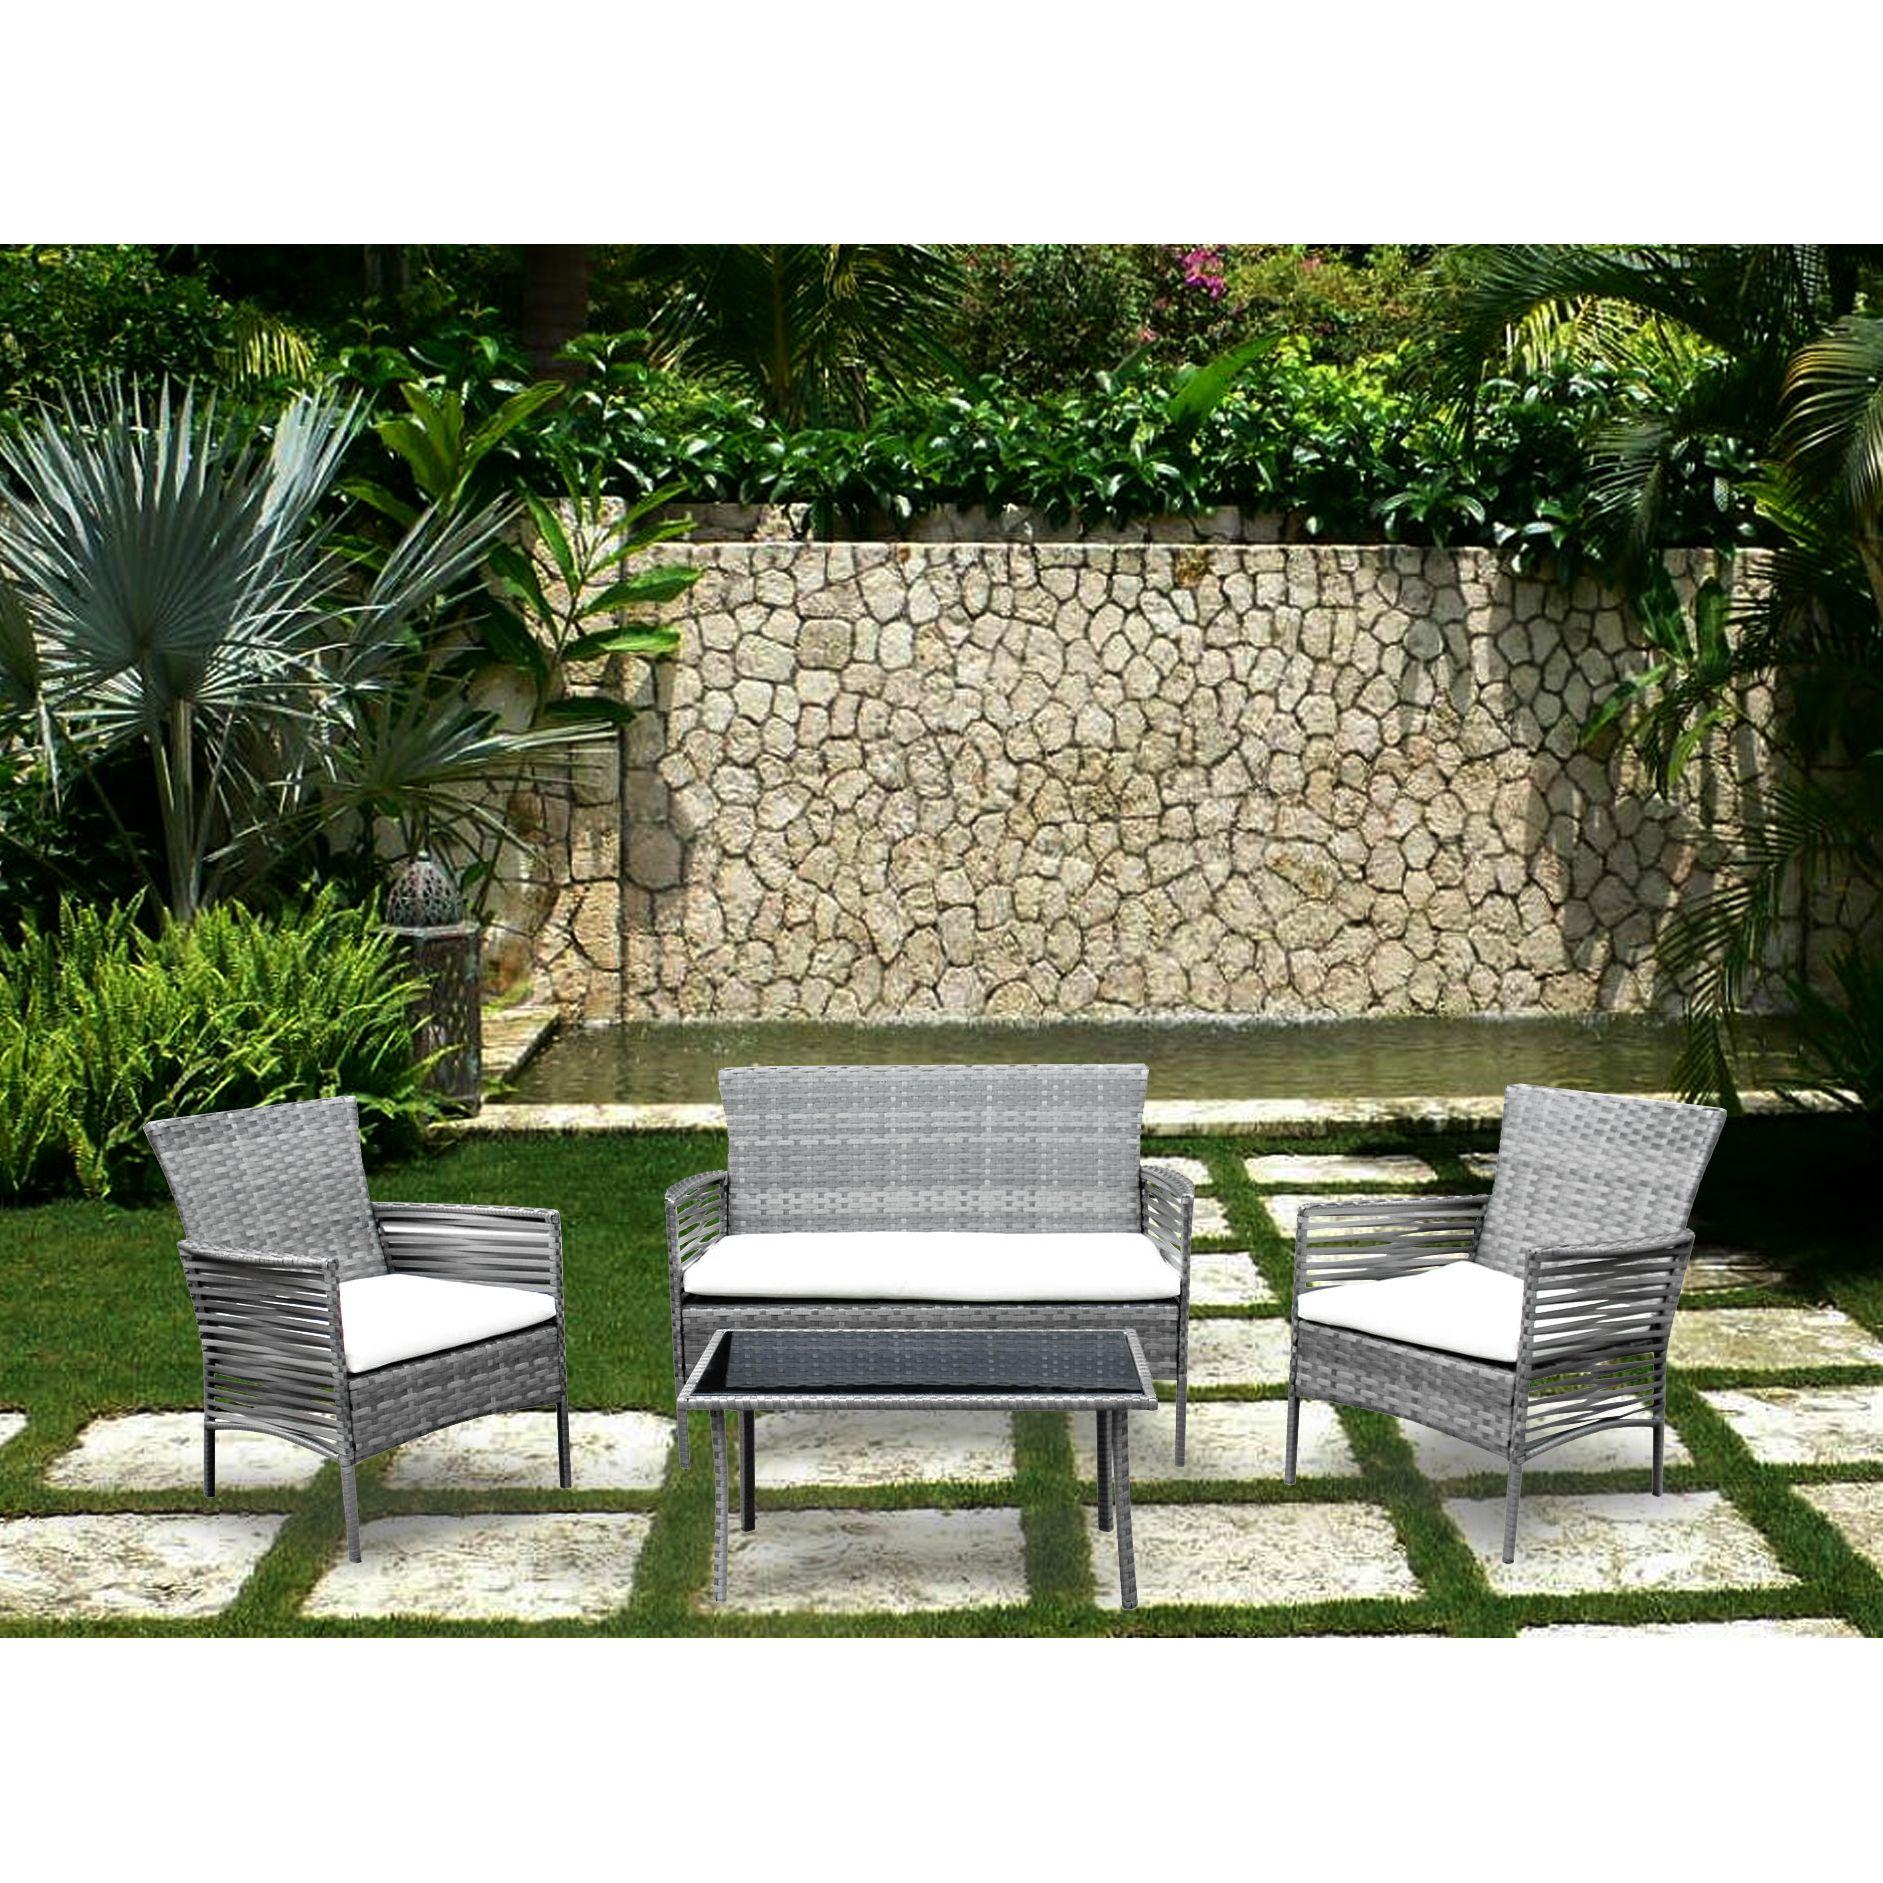 mobilier de gradina cool f xxl with mobilier de gradina top mobexpert set mobilier scaune masa. Black Bedroom Furniture Sets. Home Design Ideas